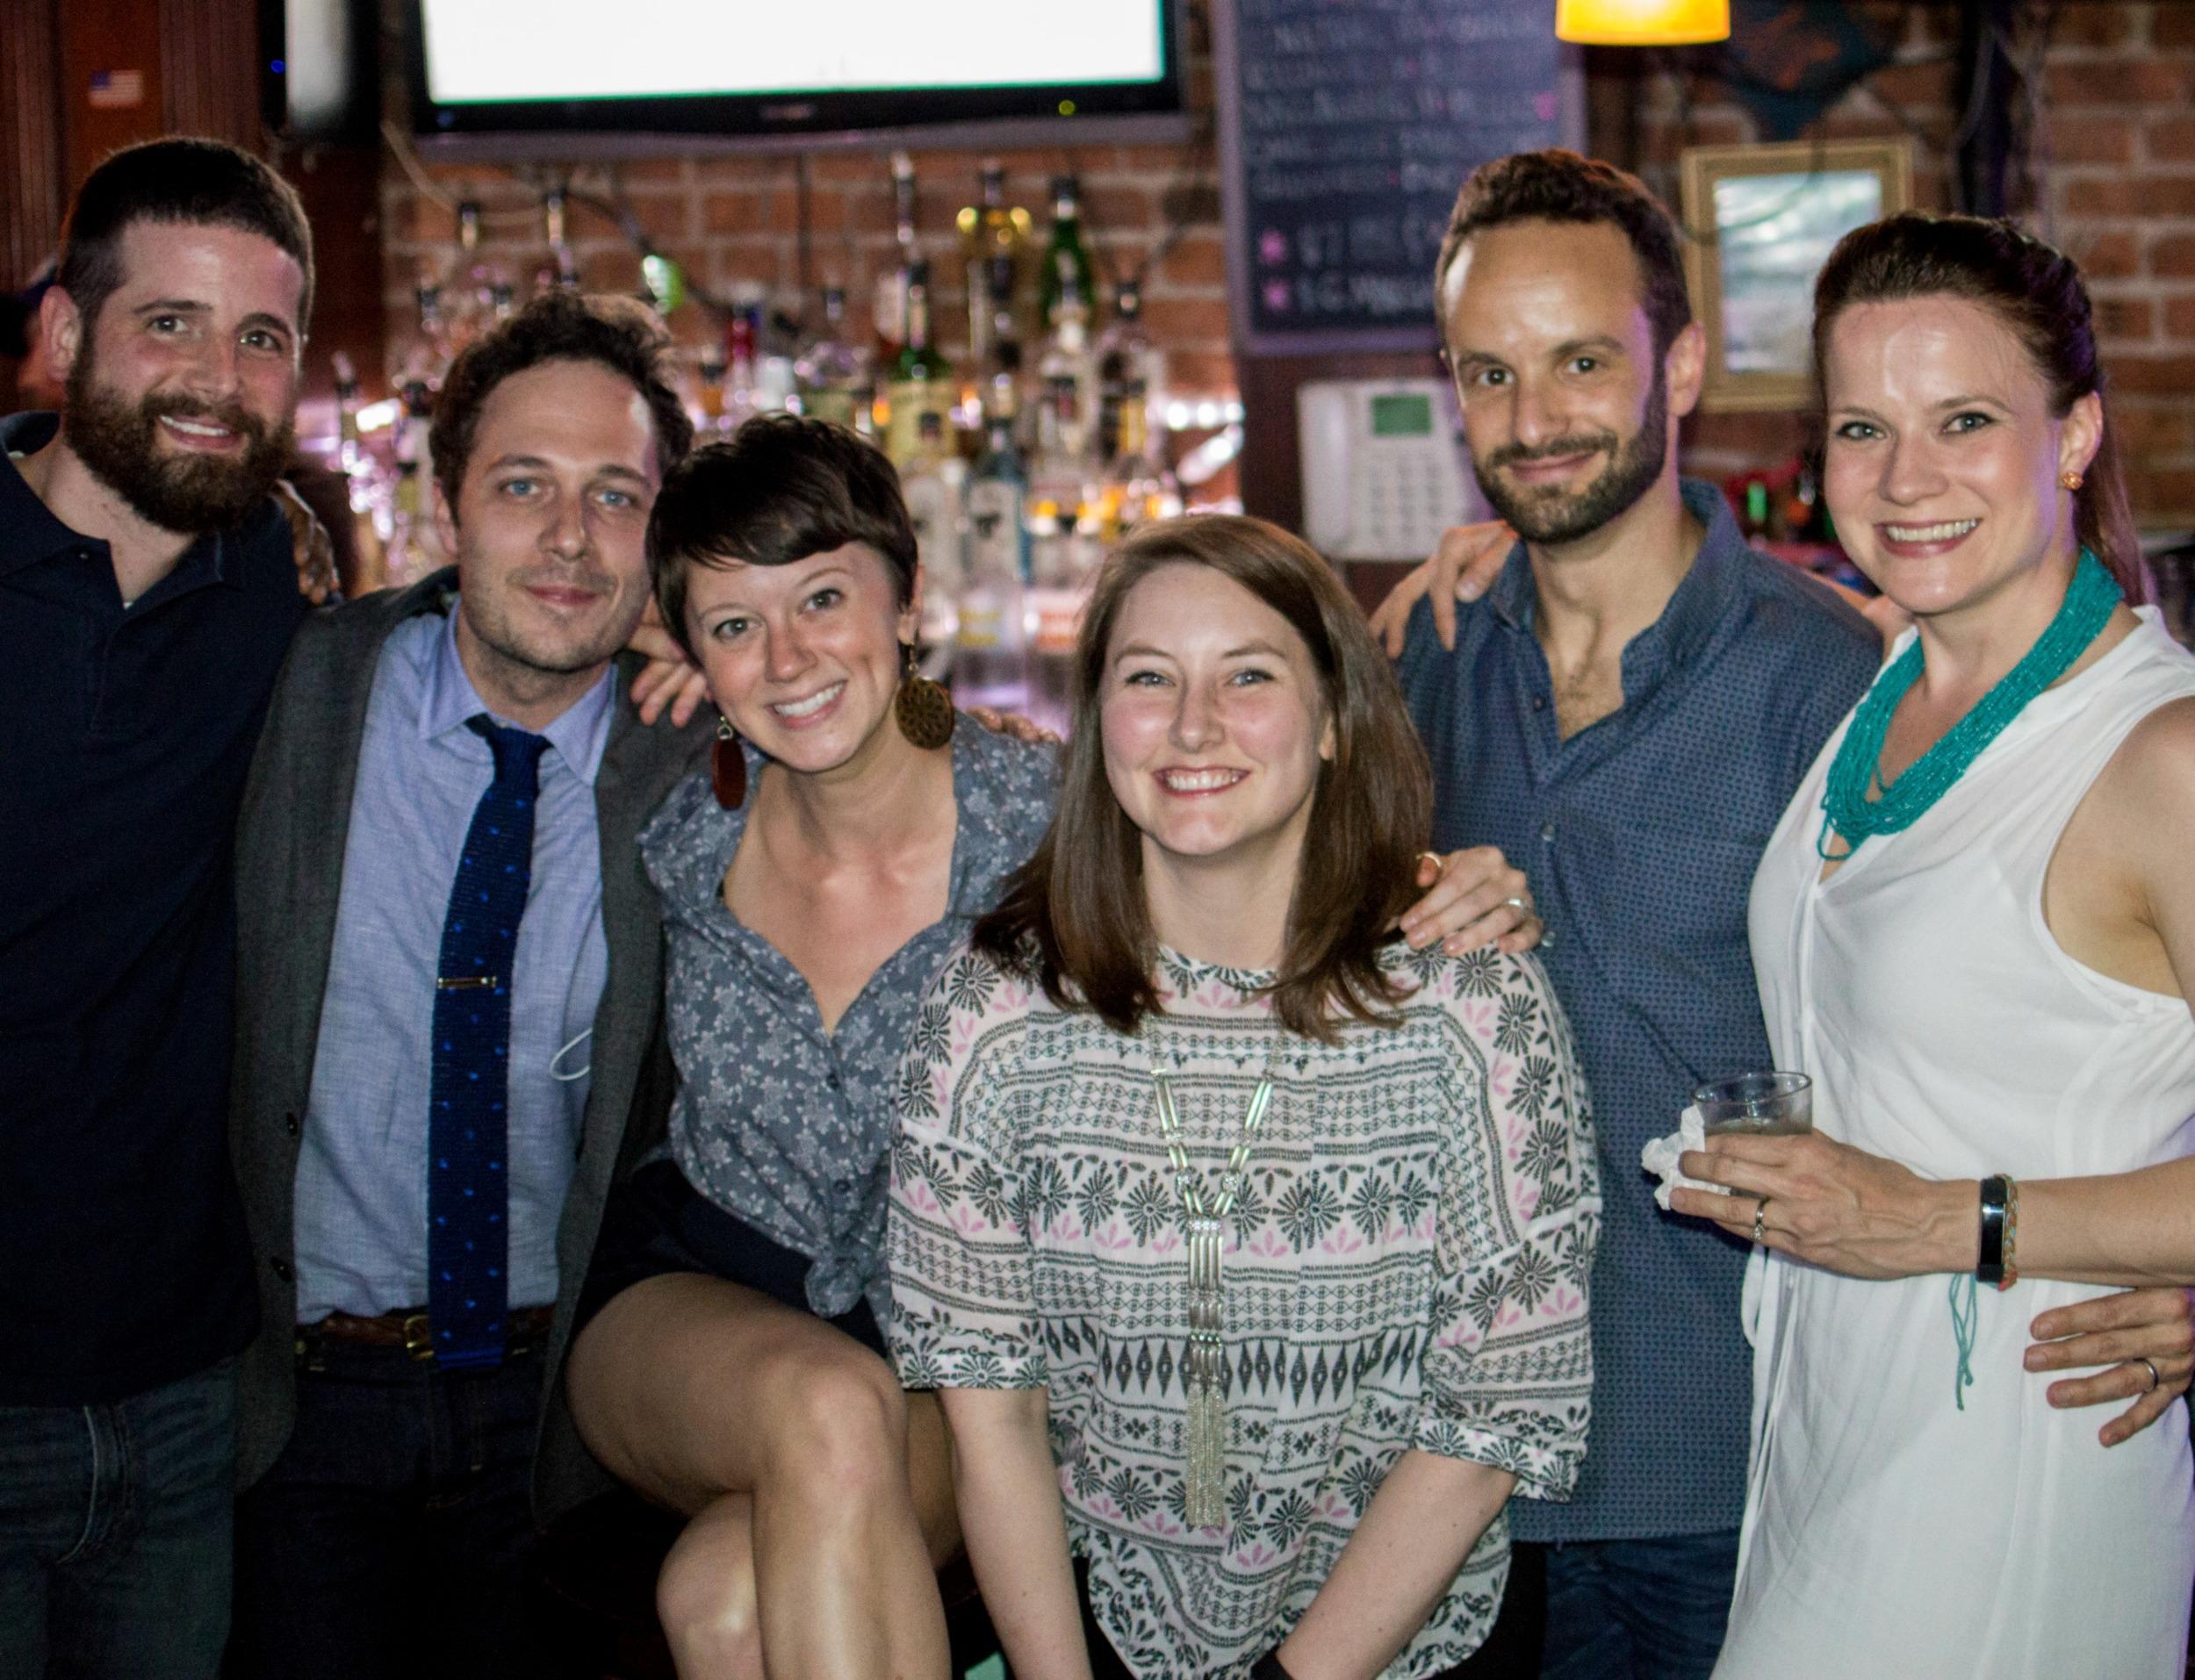 Aaron Mooney, Phil Pickens, Ashley Grombol, Erin Mooney, Nick Mills and Amelia McClain.